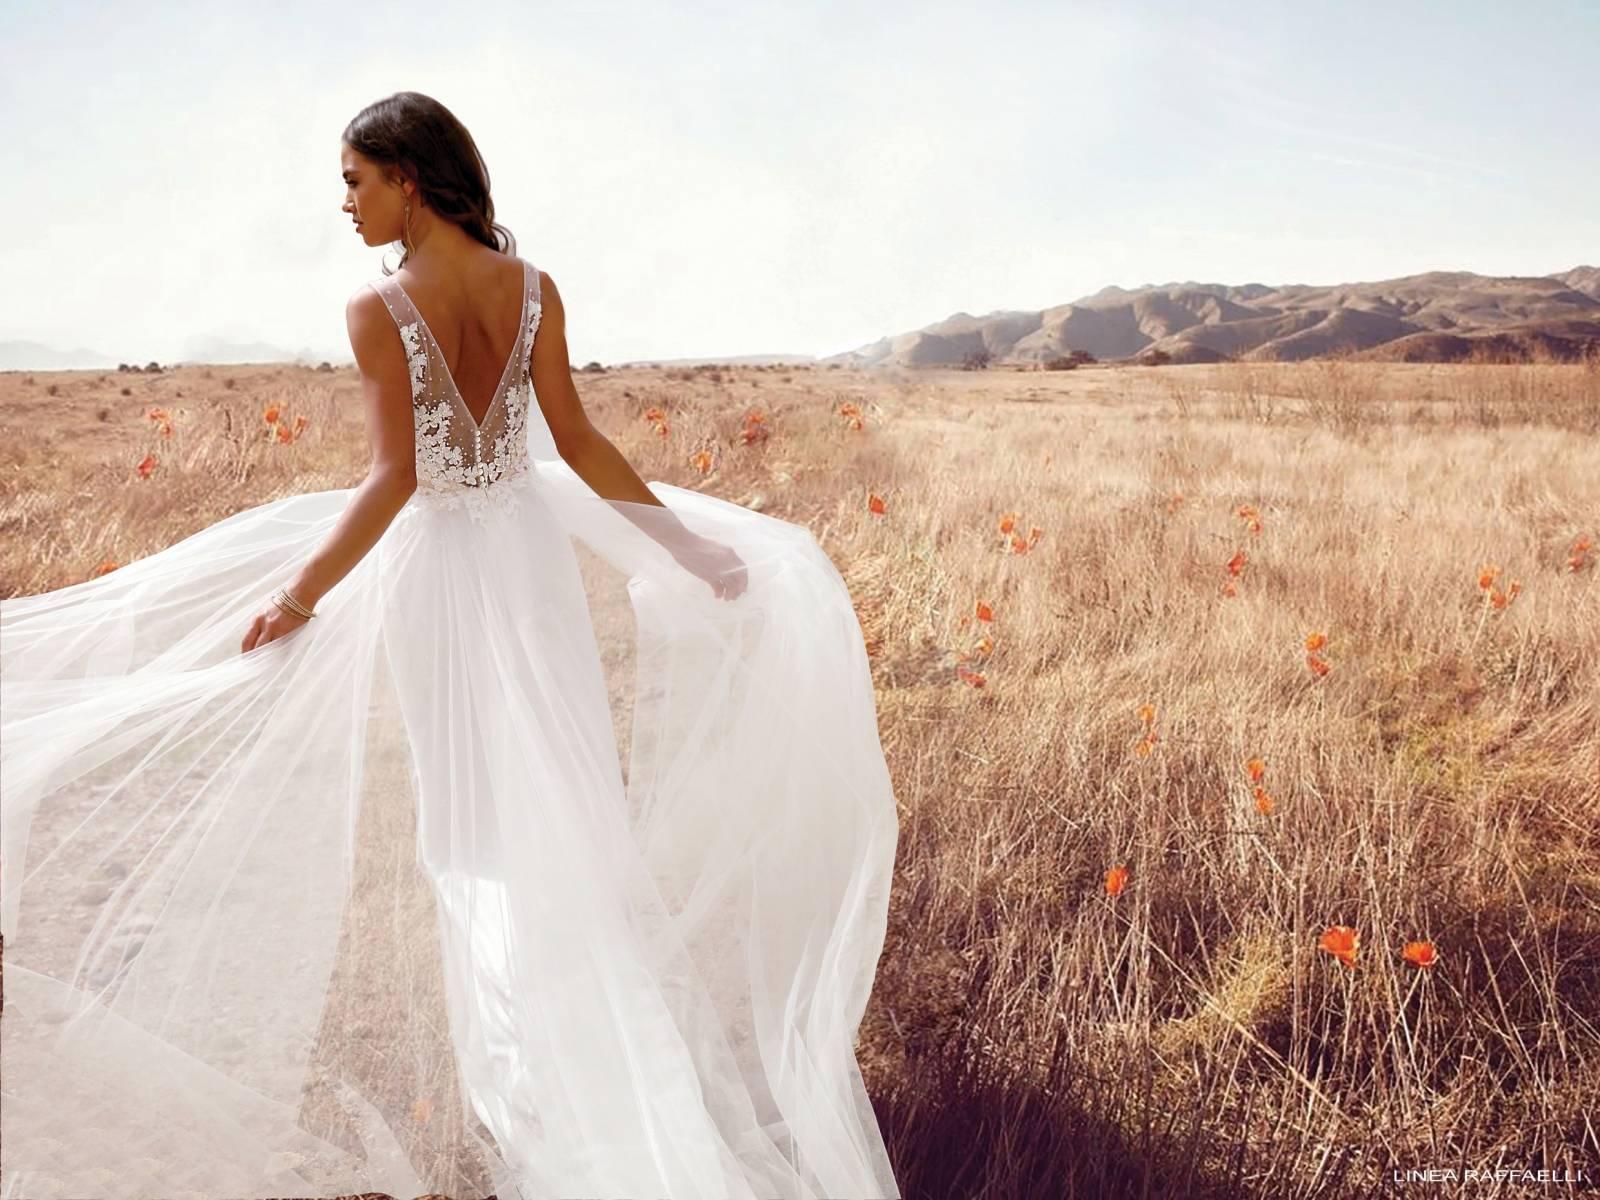 Cermo Concept - Bruidsmode winkel - Trouwjurk - Kostuum - House of Weddings - 3